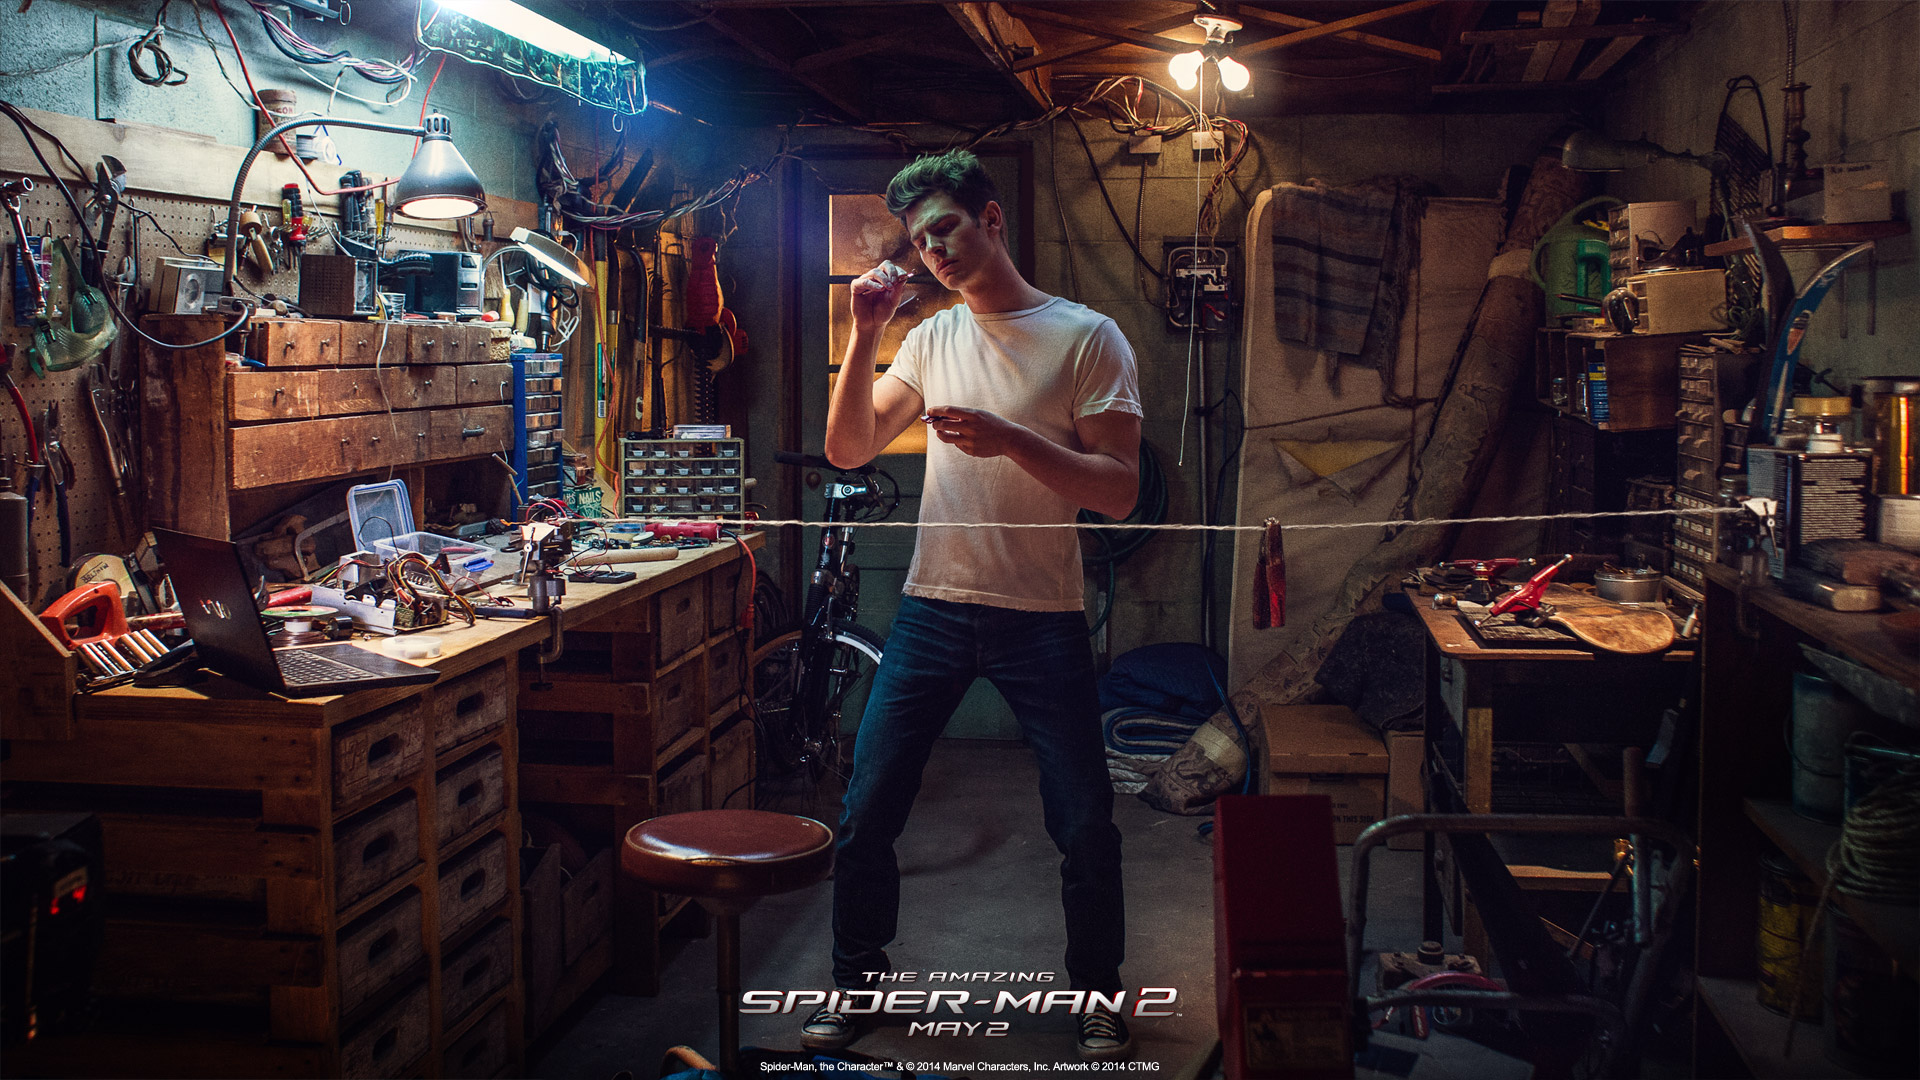 Blogging By Cinema-light: The Amazing Spider-Man 2